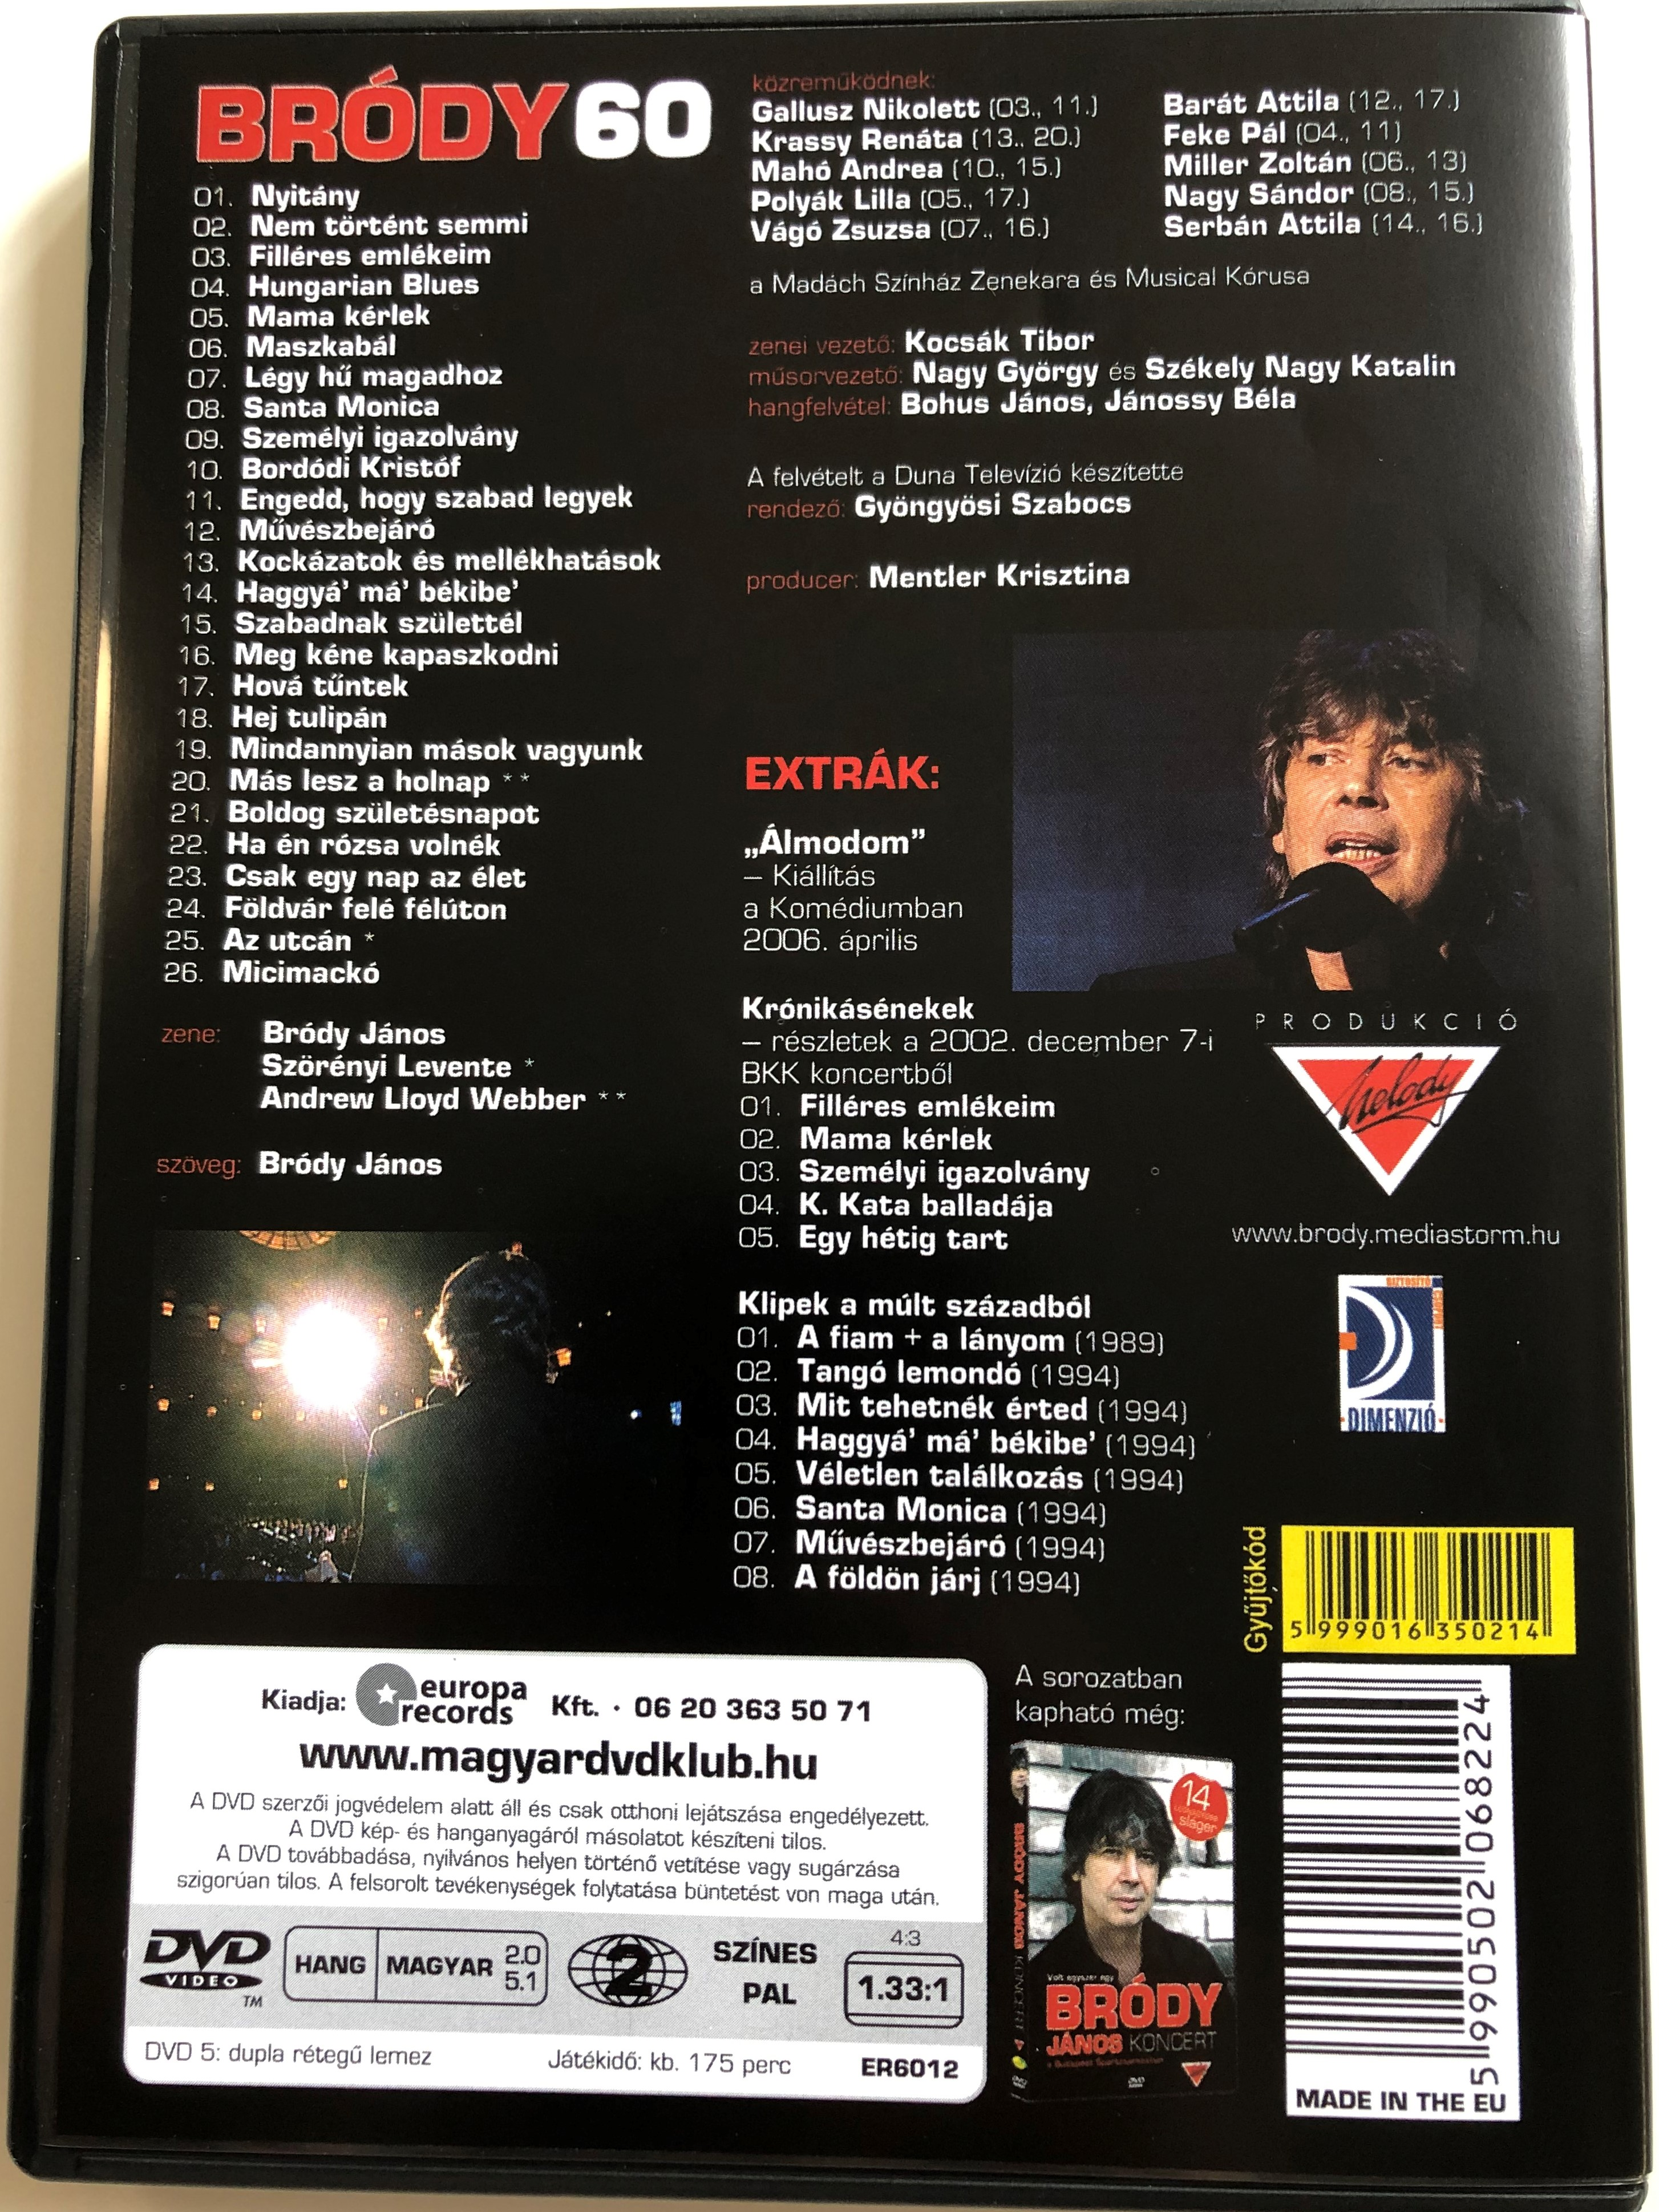 br-dy-60-dvd-sz-let-snapi-koncert-a-mad-ch-sz-nh-zban-2006-2.jpg